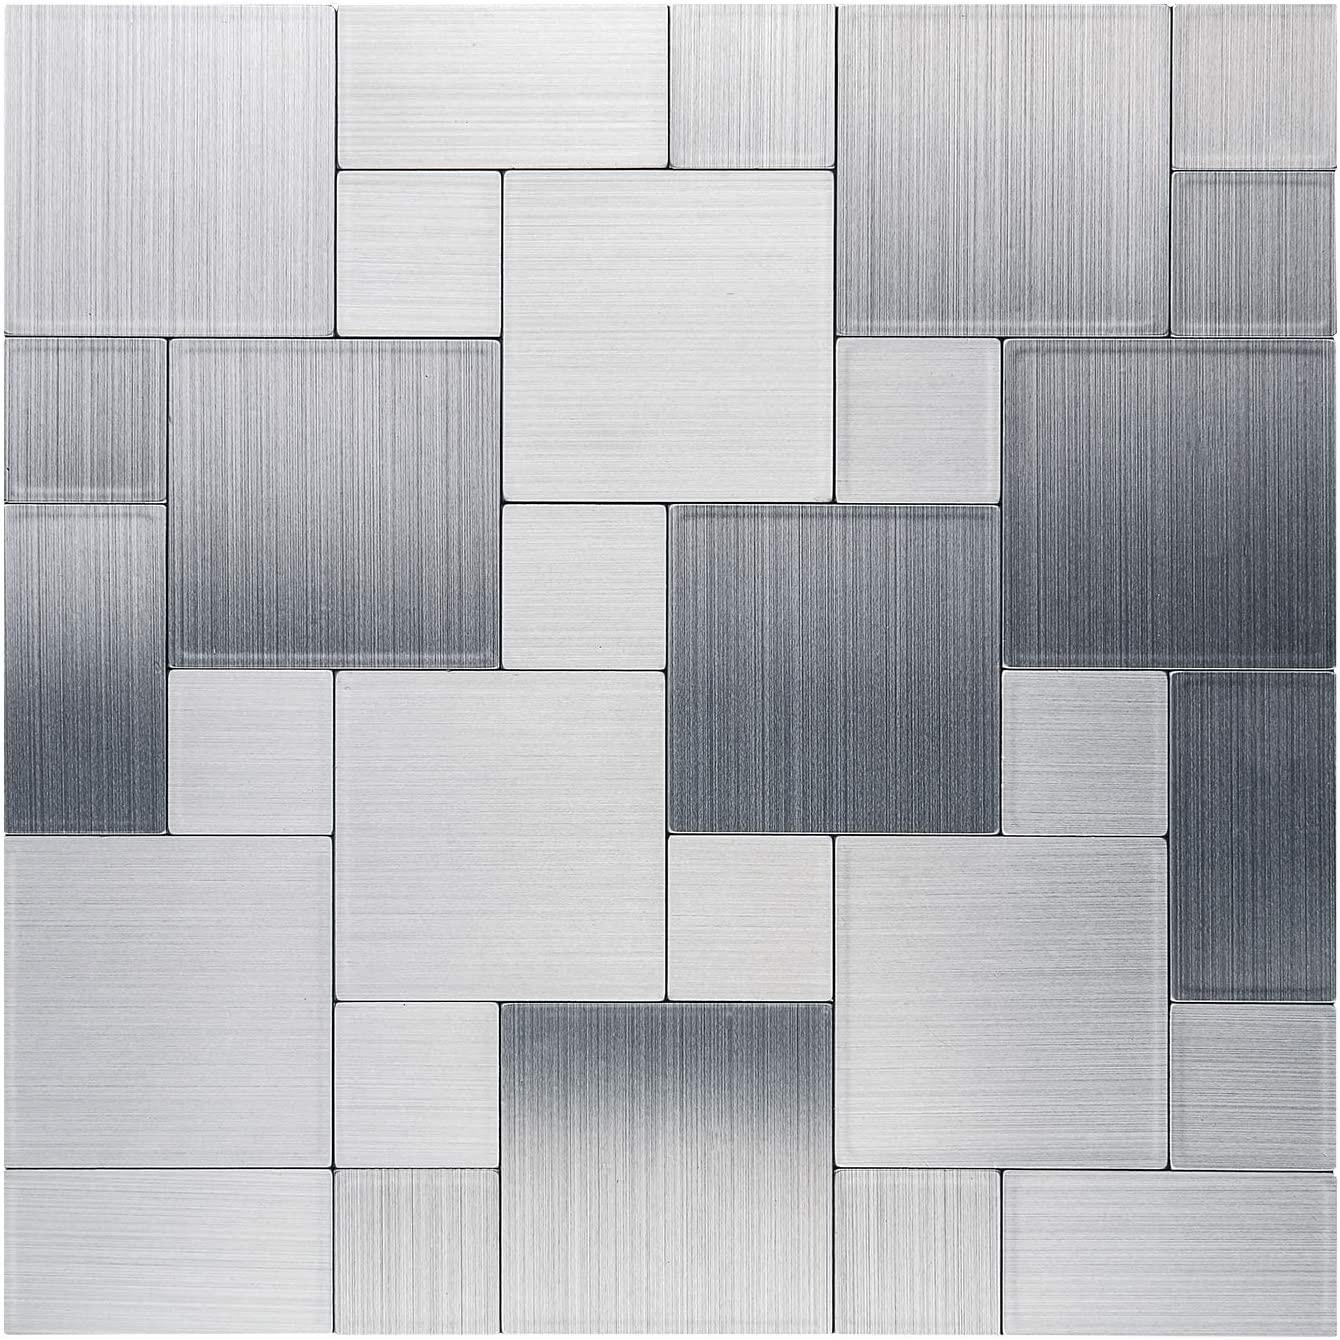 LK 5pcs Premium Self-Adhesive Metal Tiles - Peel and Stick Backsplash Tiles for Kitchen (LKB6203, 12